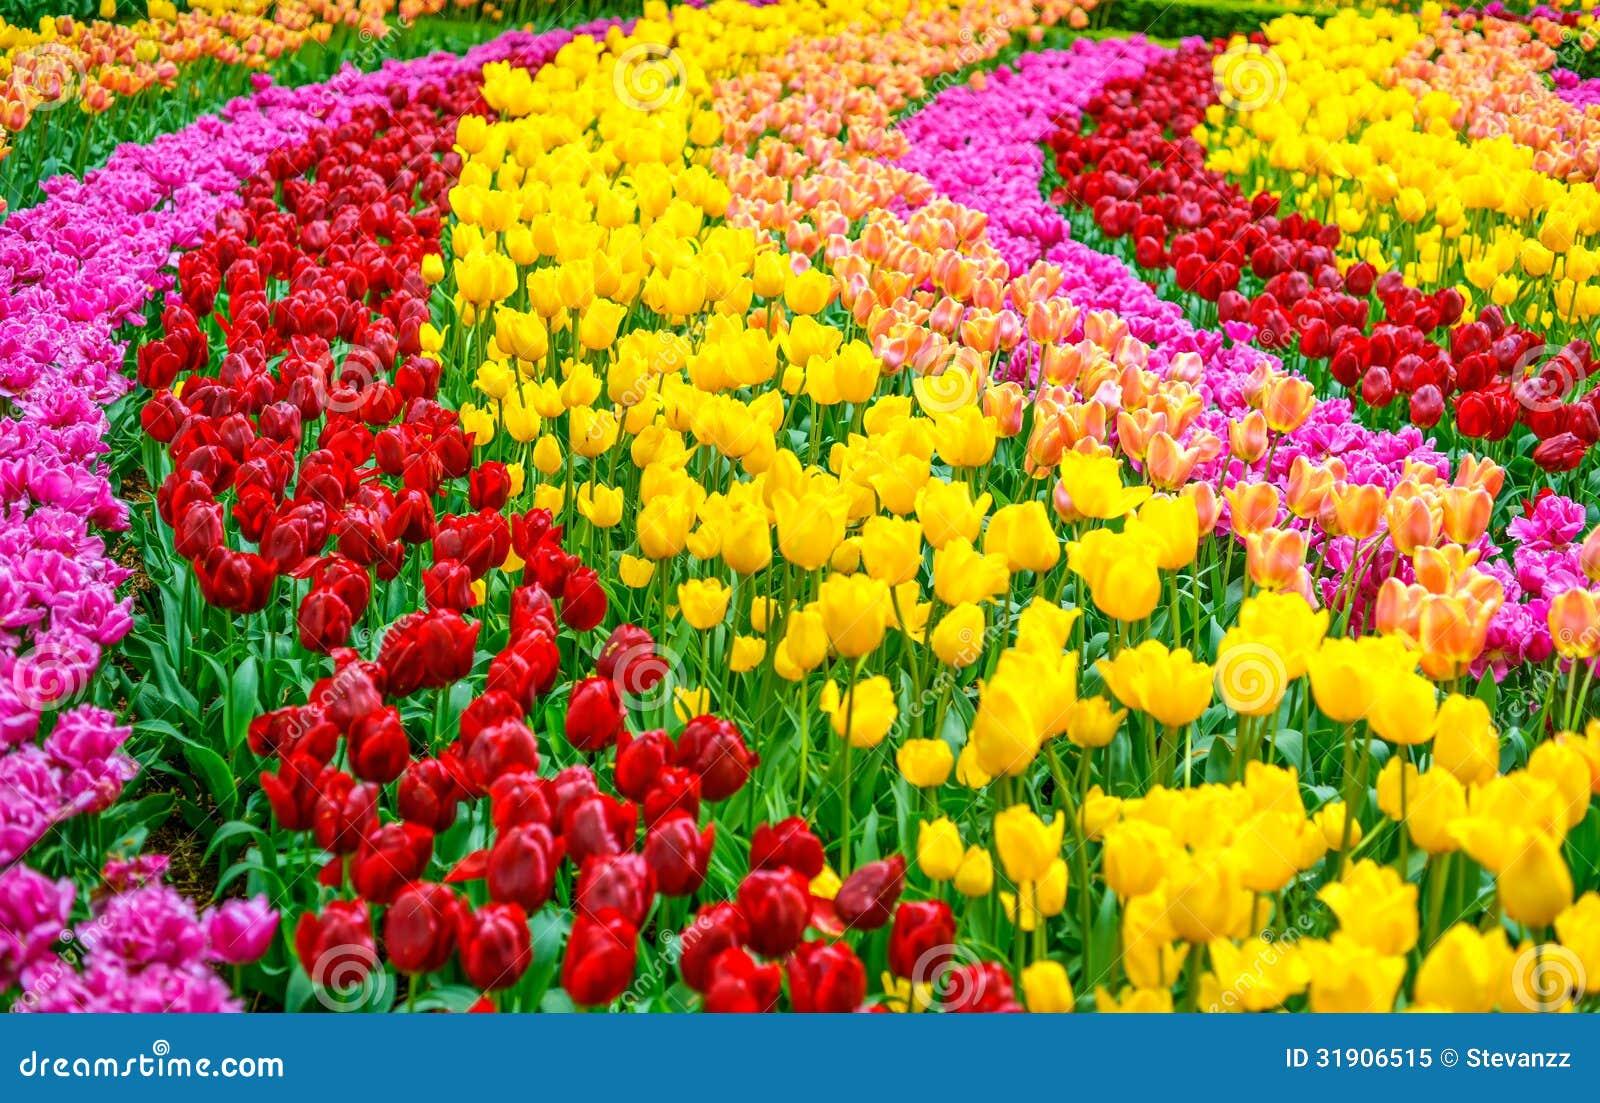 Предпосылка или картина сада цветков тюльпана весной